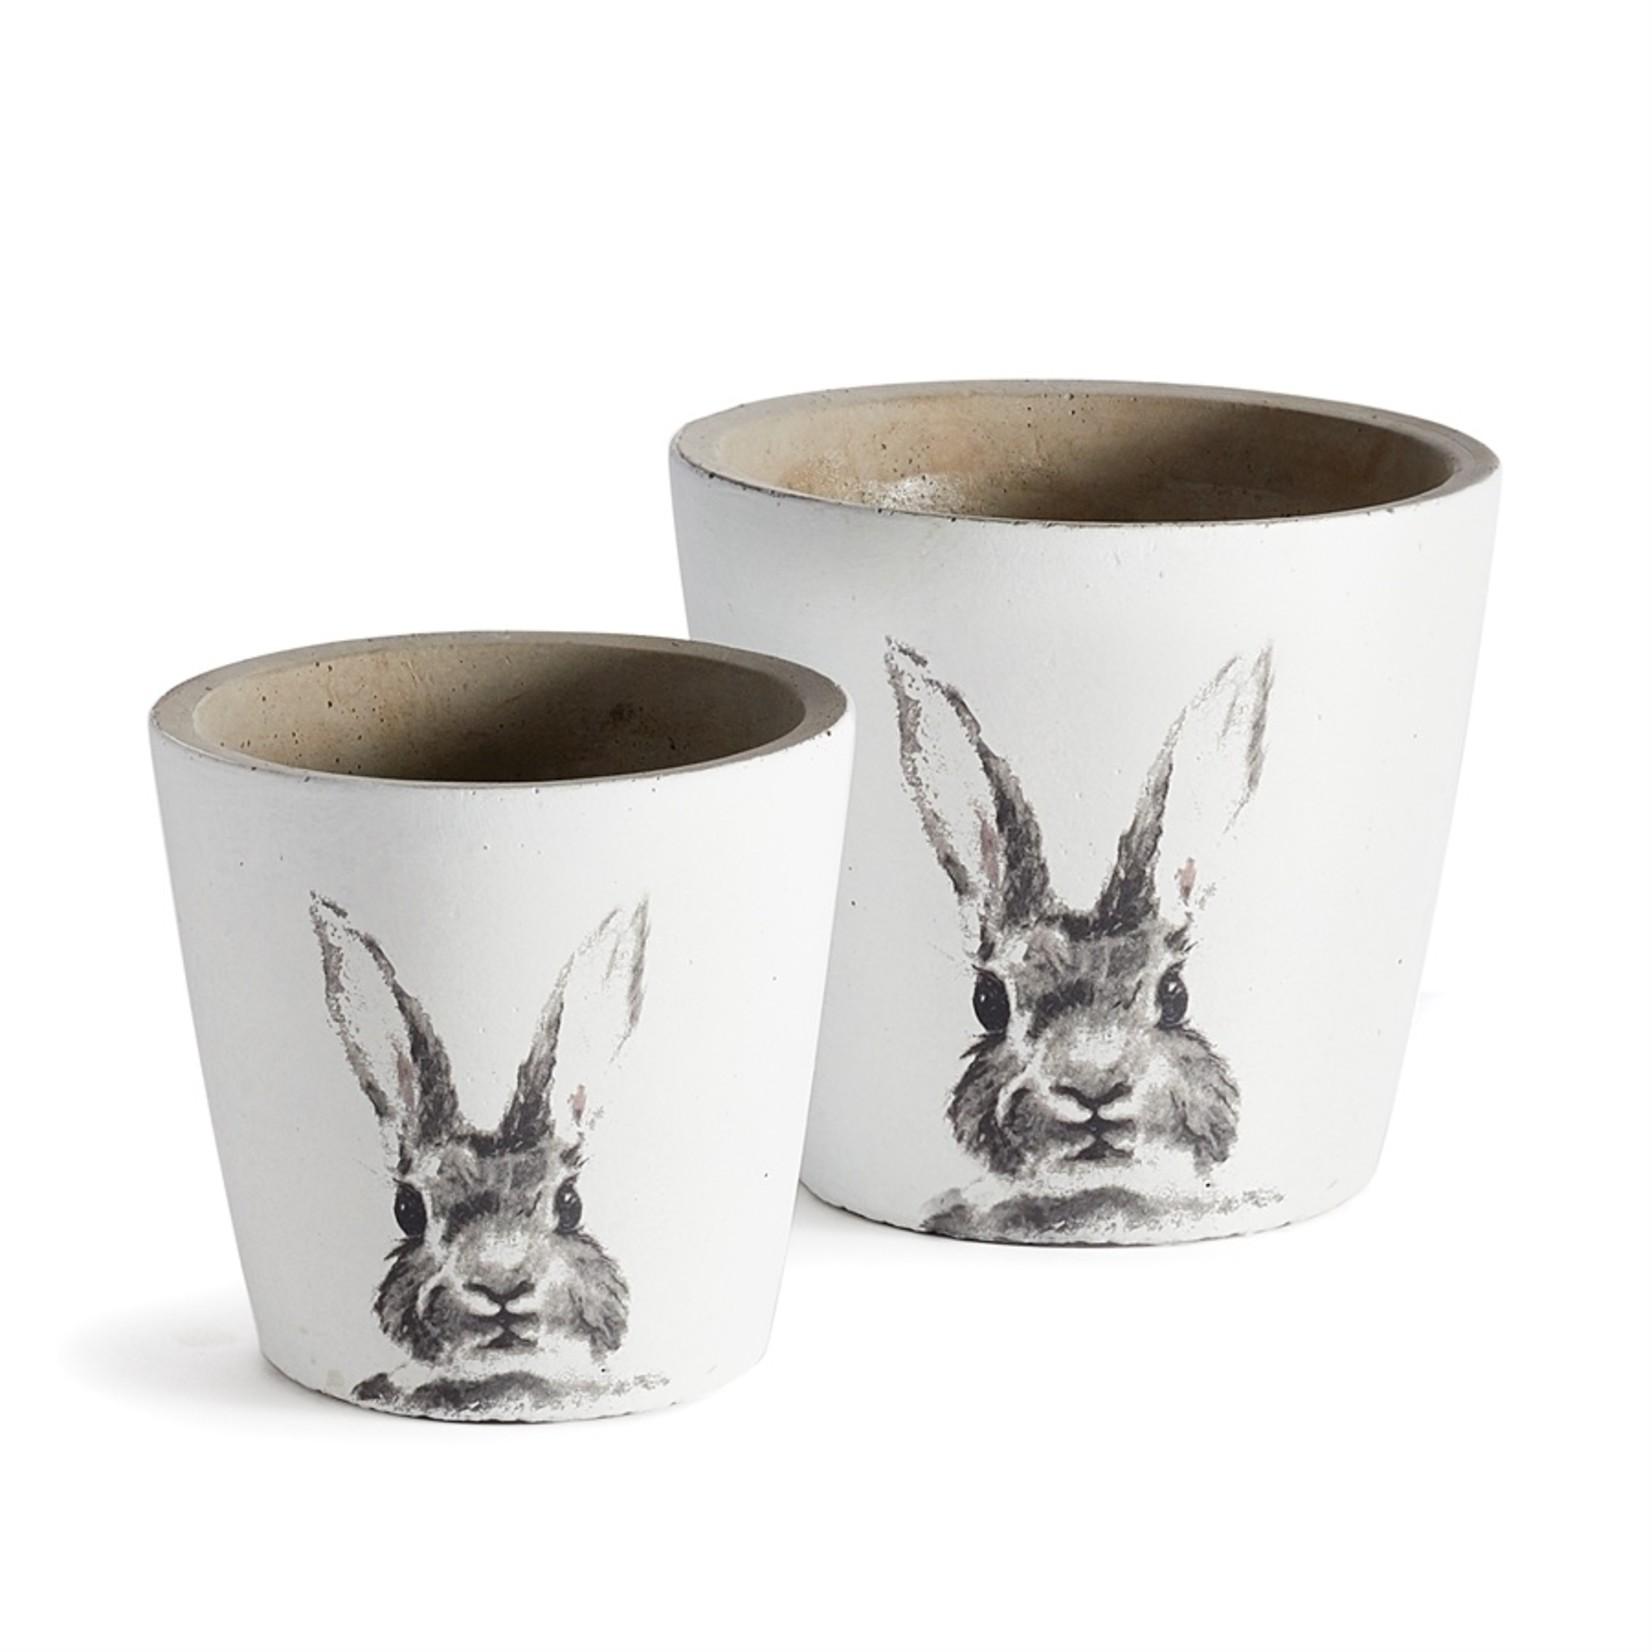 Napa Home and Garden Rabbit Pots